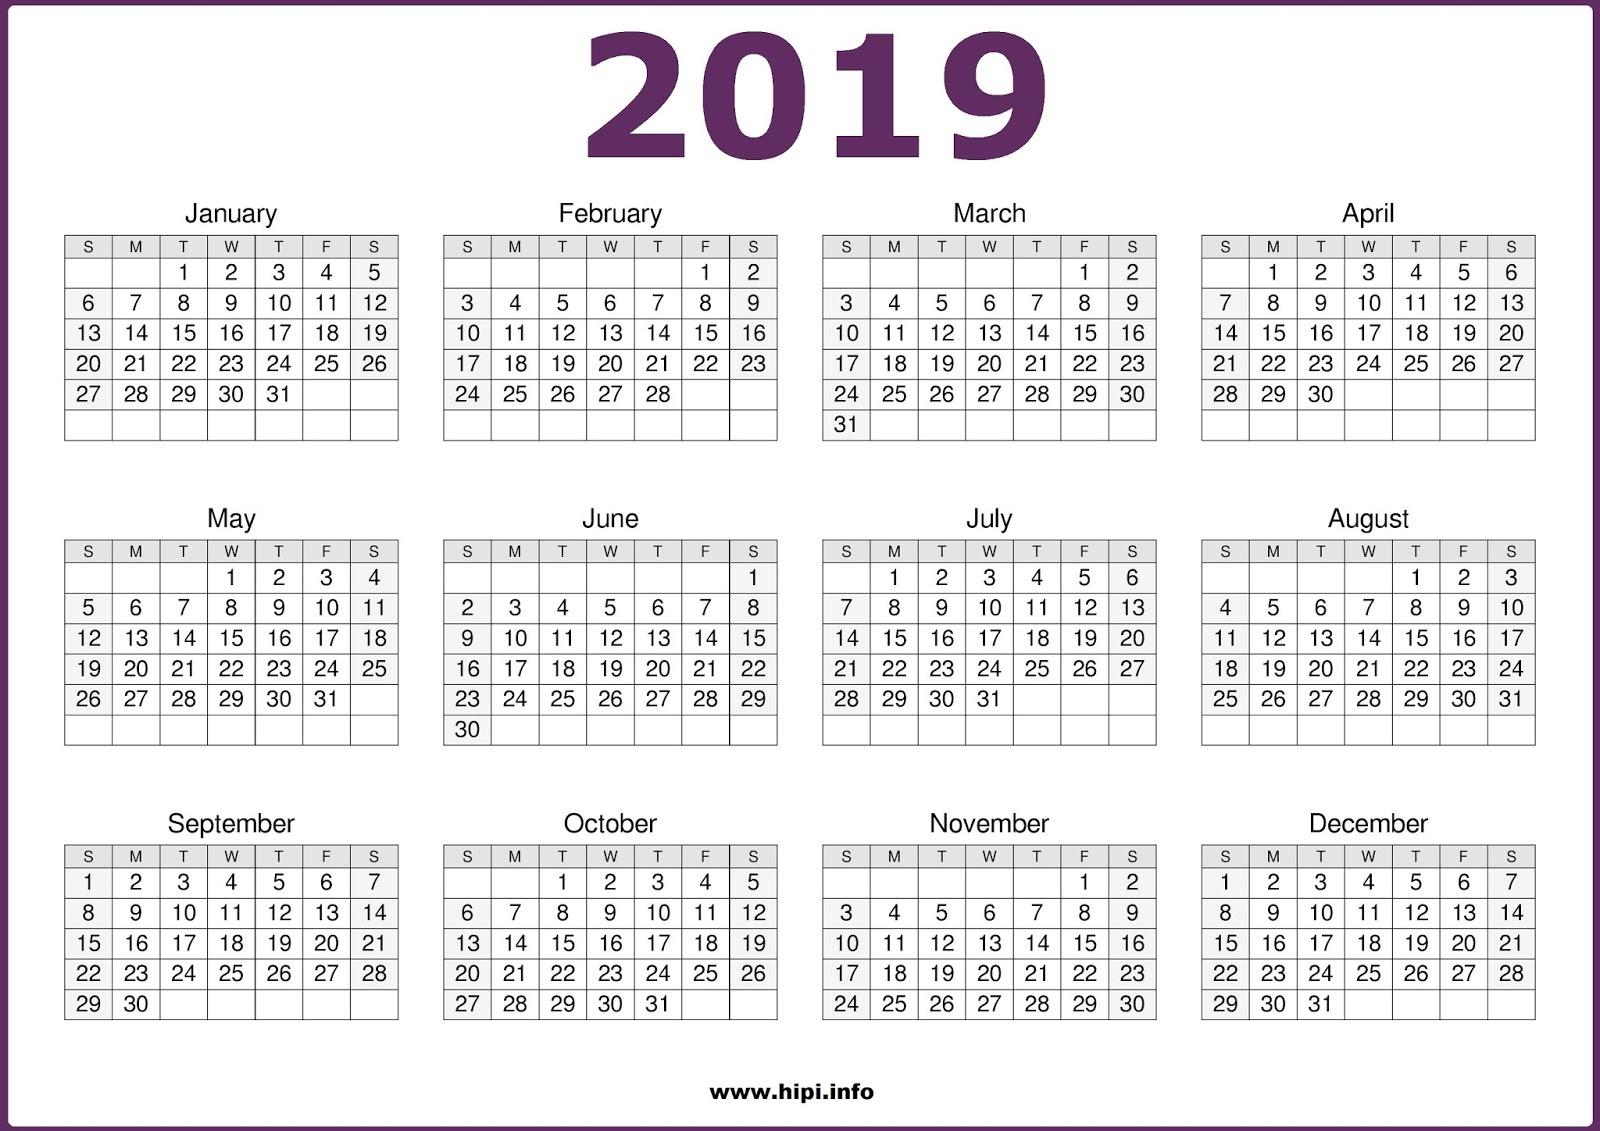 Printable 2019 Calendar Nsw | Printable Calendar 2019 intended for Calendar October 2019 Nsw Printable